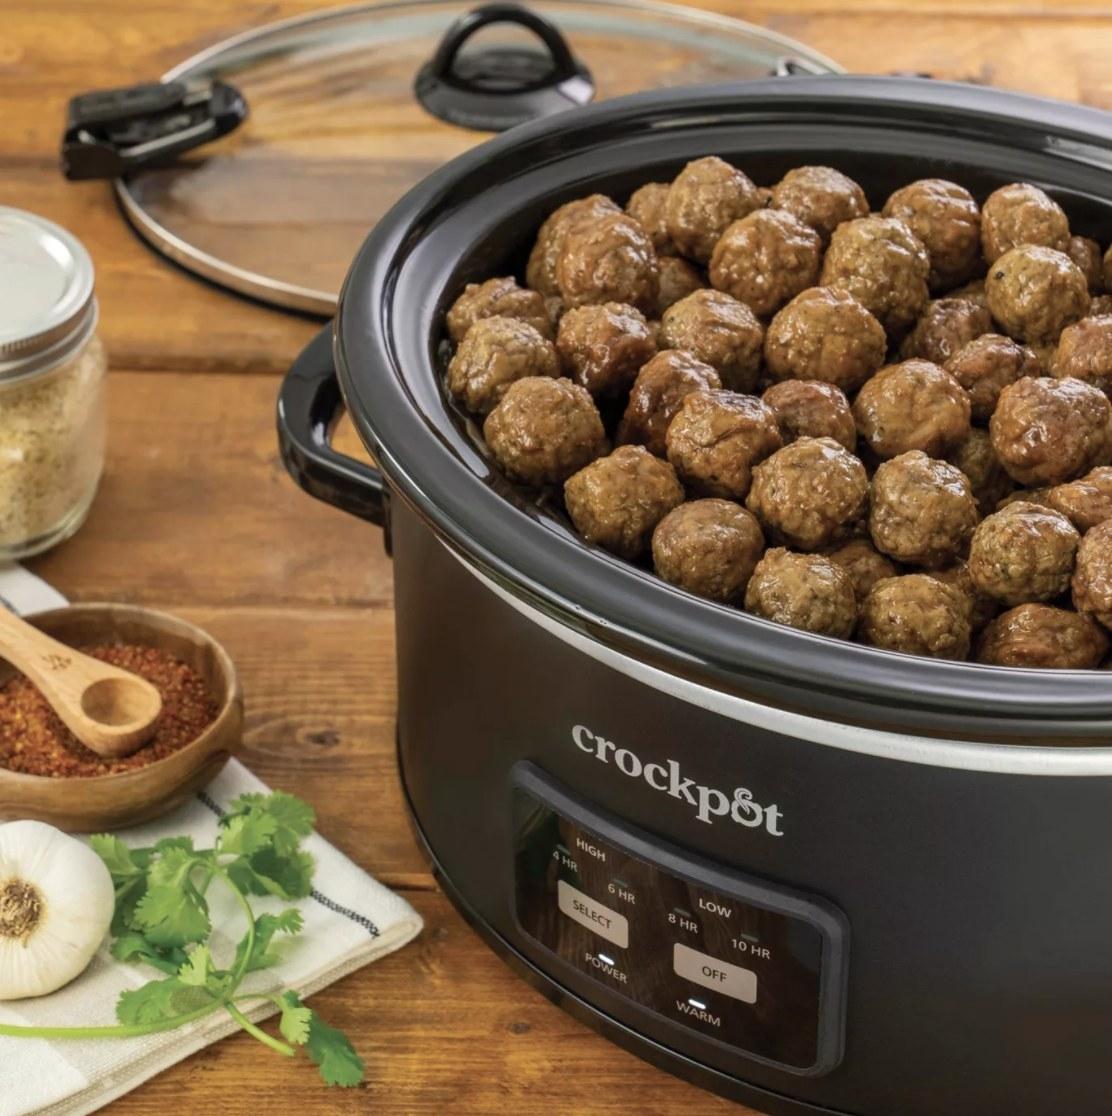 the crock pot with meatballs inside